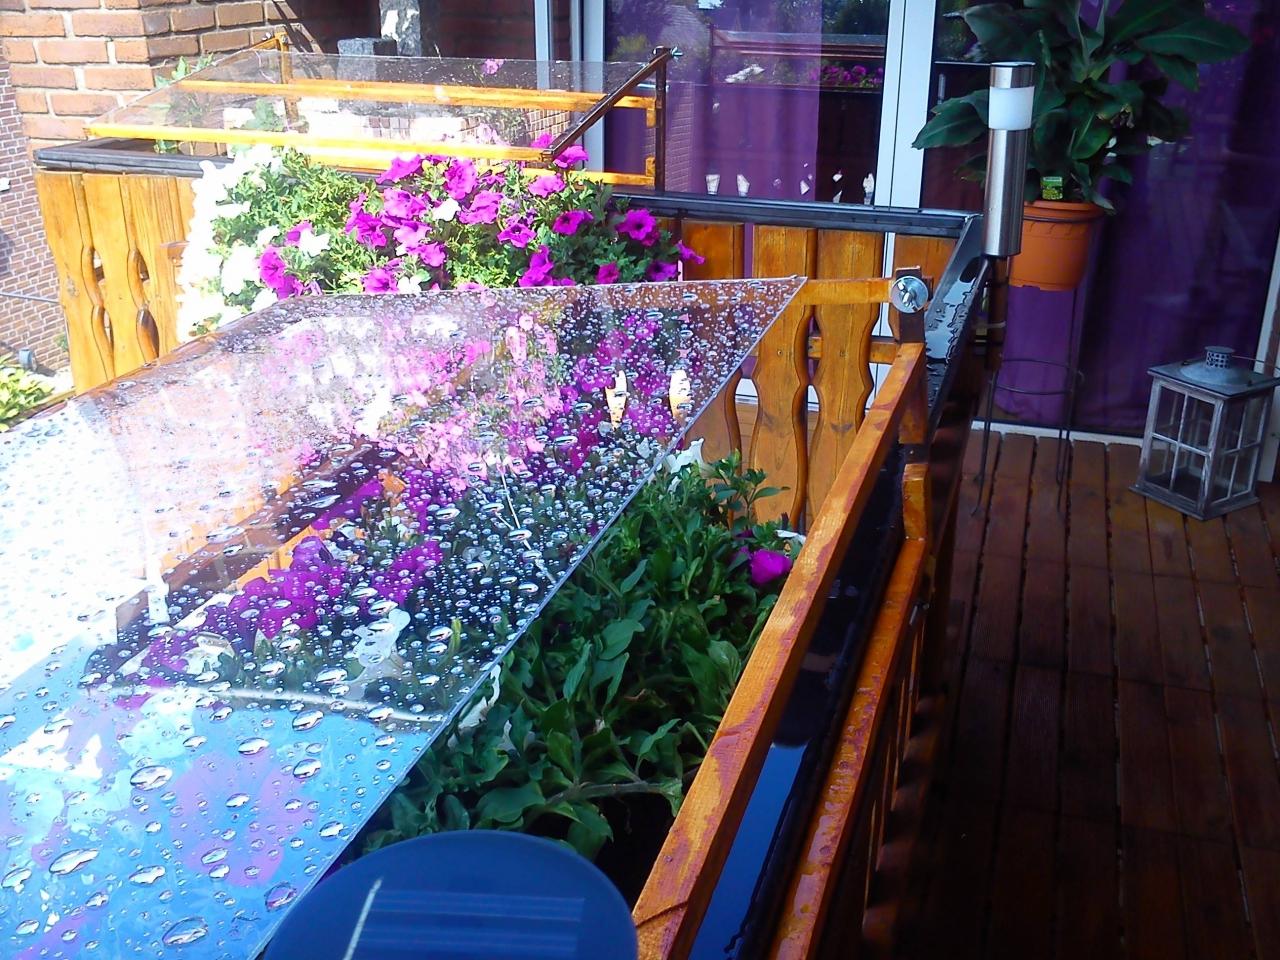 Balkonblumen überdachung